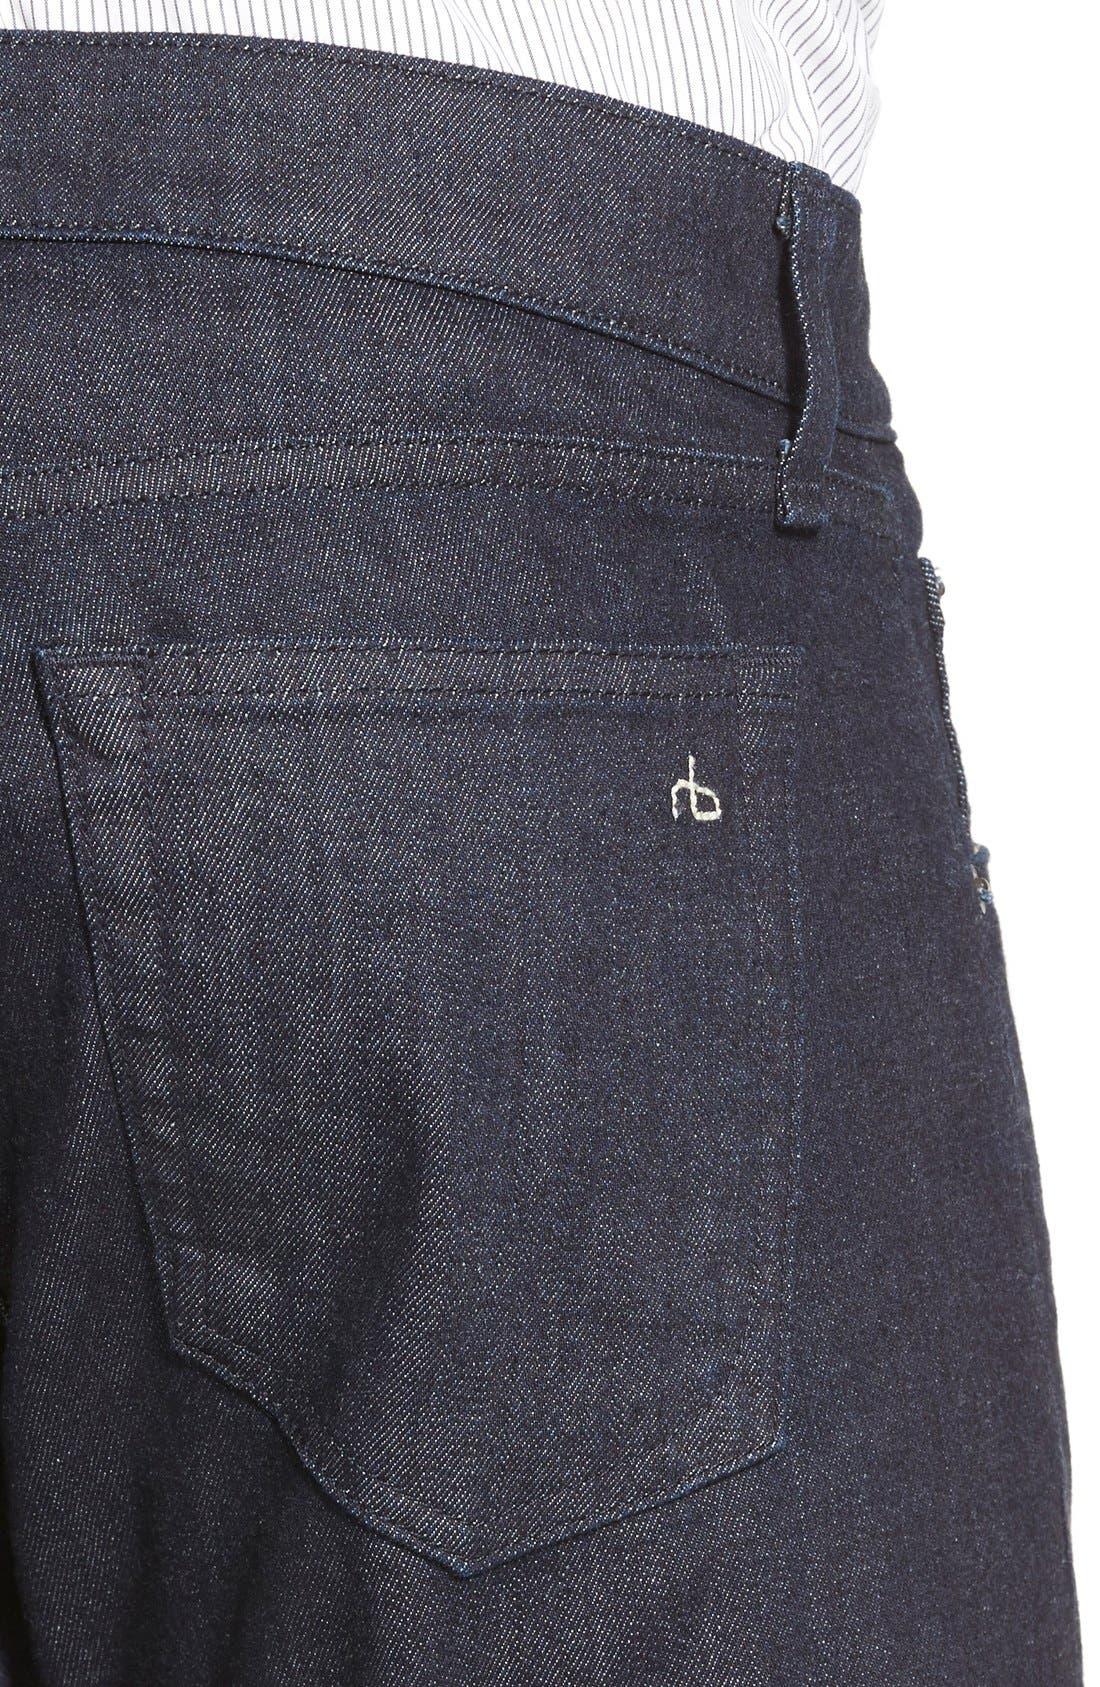 RAG & BONE, Standard Issue Fit 2 Slim Fit Jeans, Alternate thumbnail 7, color, TONAL RINSE